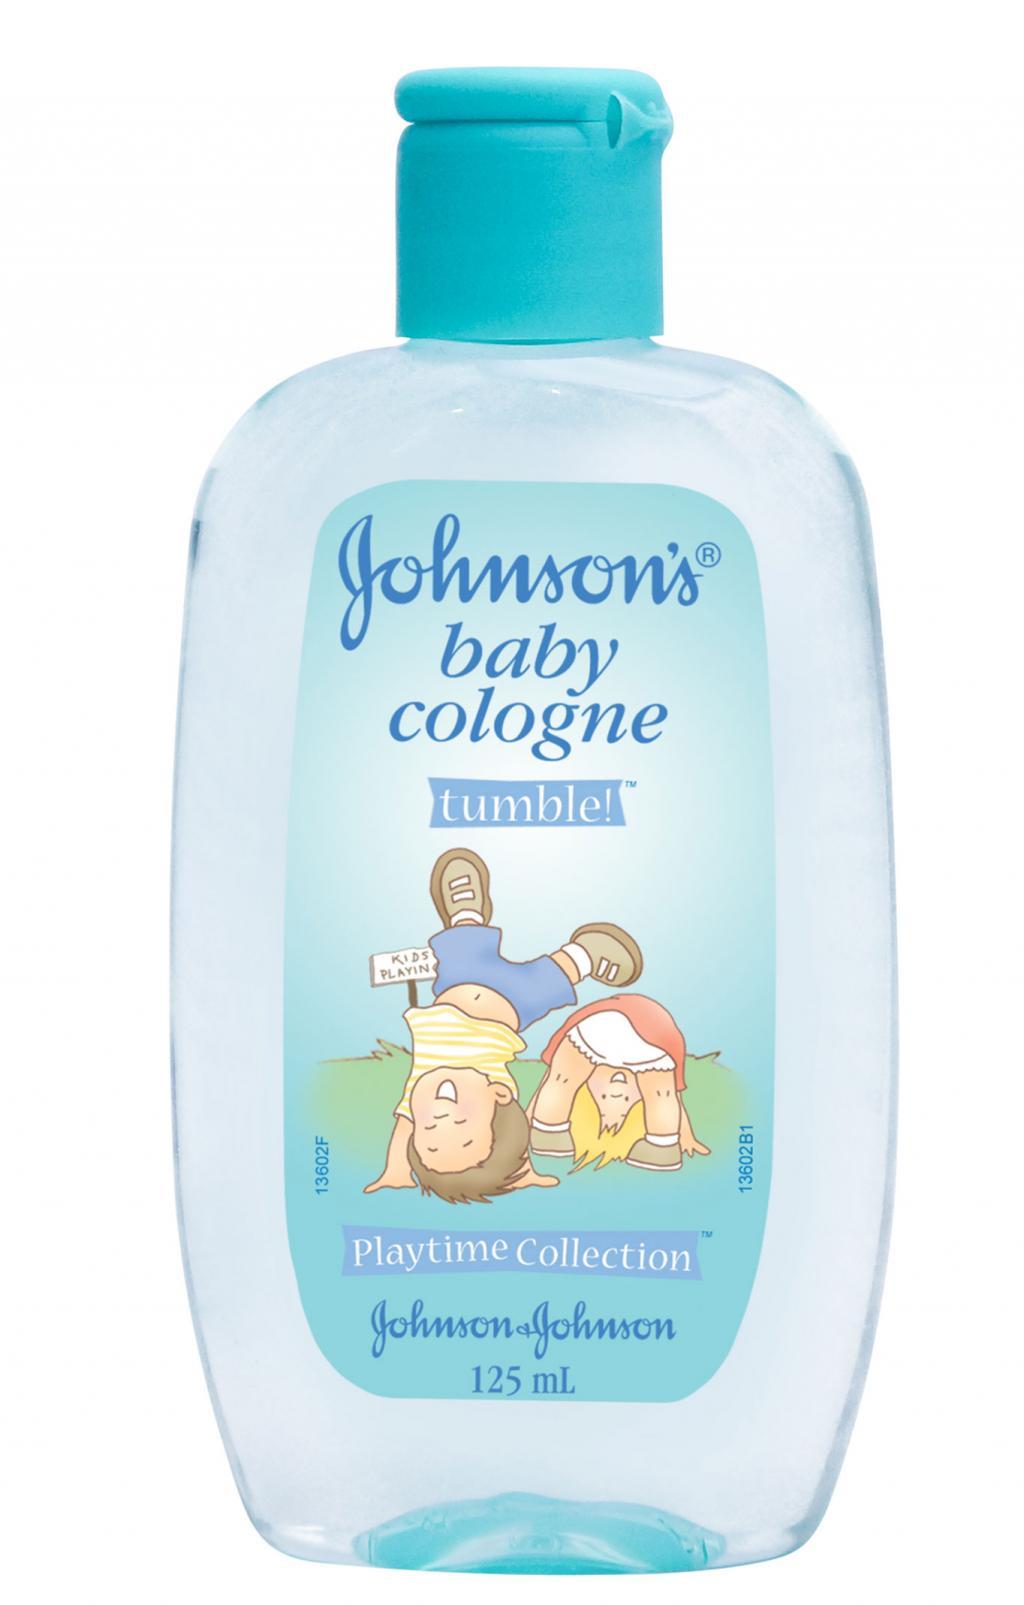 JOHNSON'S® baby cologne tumble